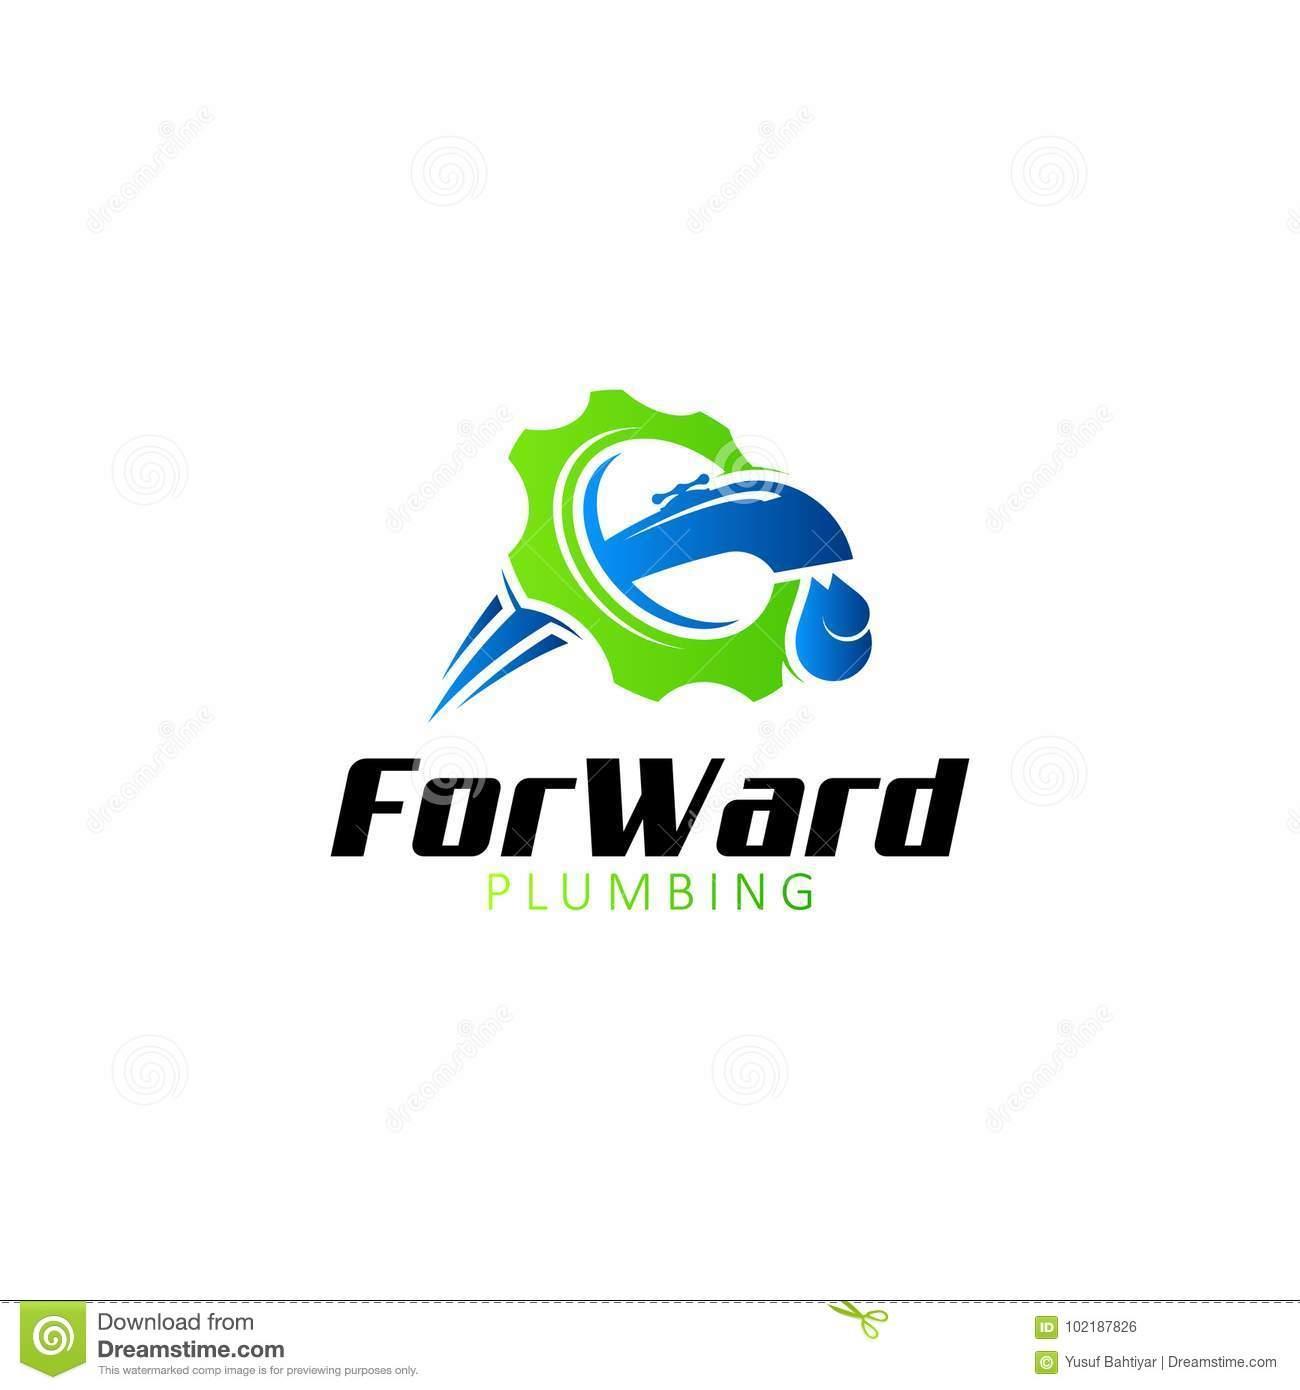 Free Editable Company Logo Templates